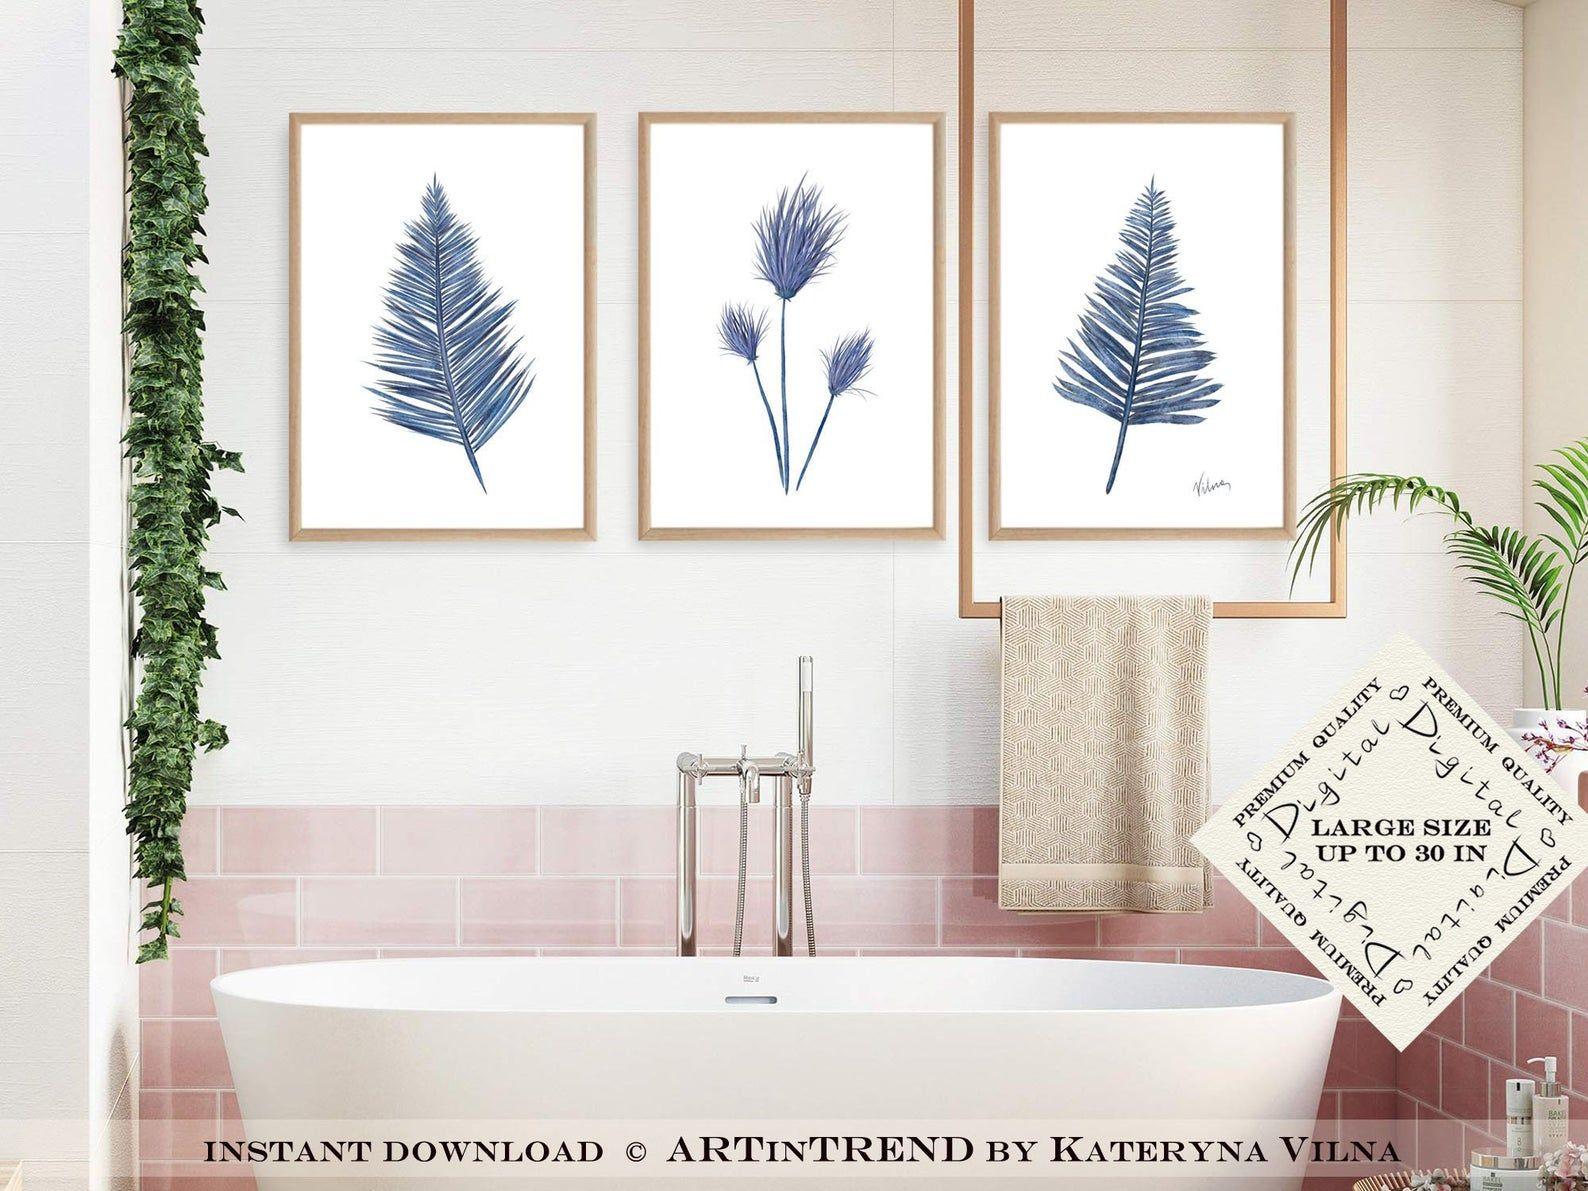 Tropical Leaves Set Of 3 Bathroom Wall Decor Downloadable Etsy In 2020 Bathroom Wall Decor Tropical Wall Art Leaf Wall Art